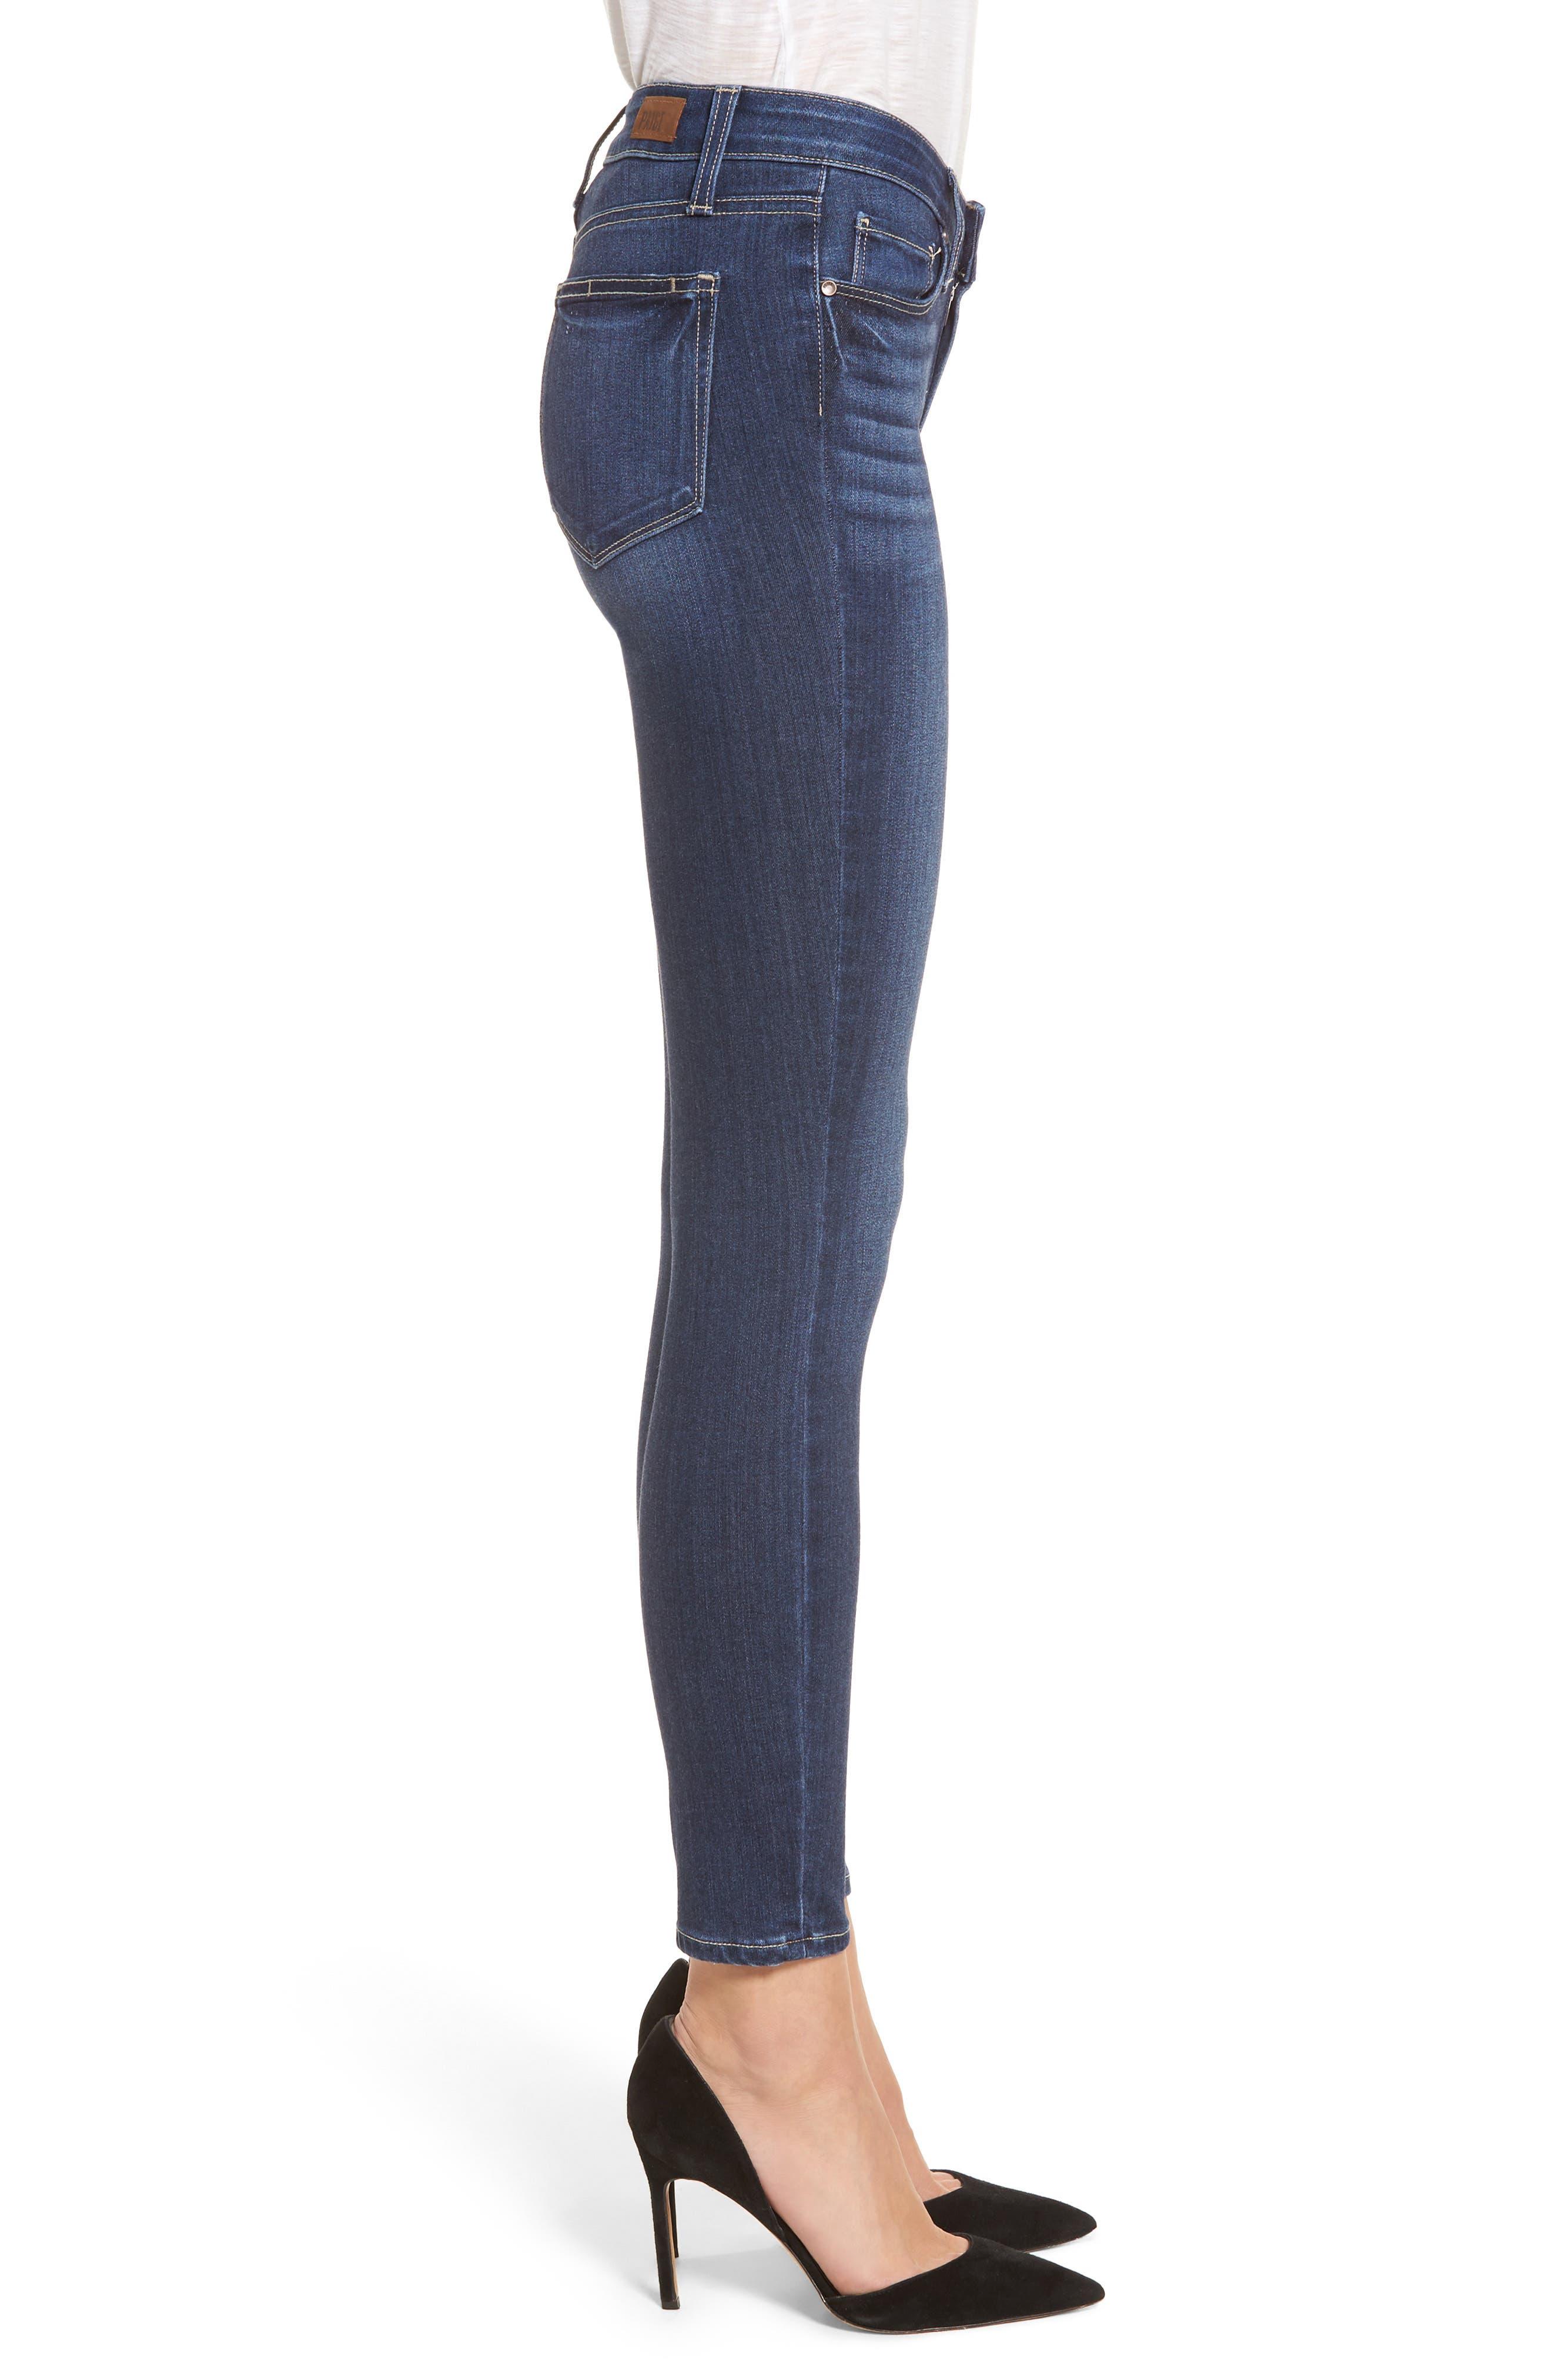 Transcend - Verdugo Ankle Skinny Jeans,                             Alternate thumbnail 3, color,                             Blue